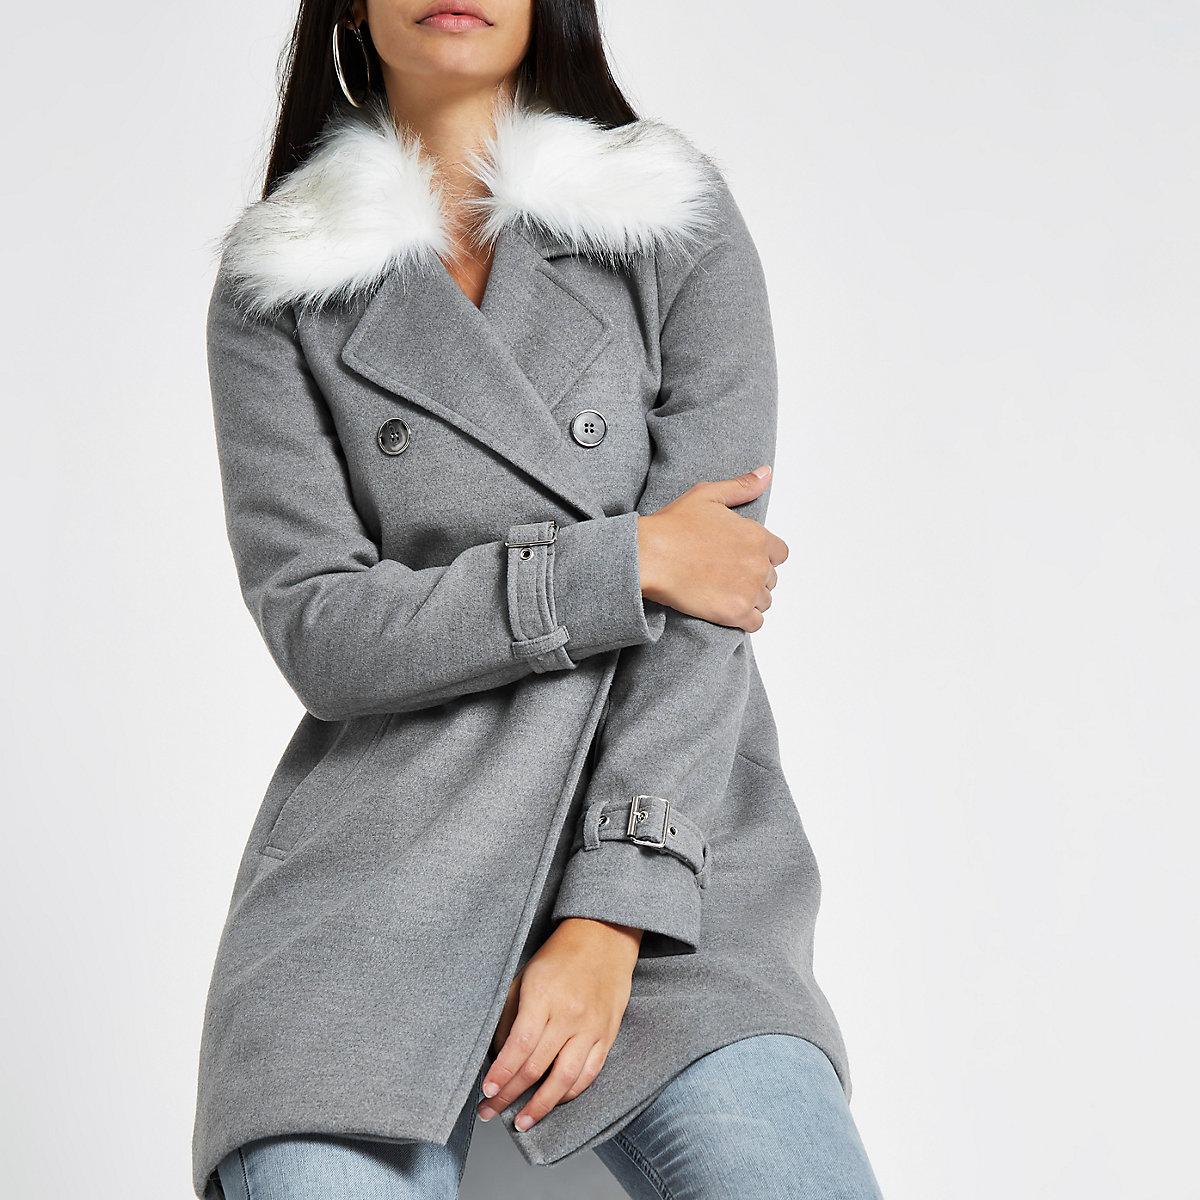 Grauer Mantel Mit Kunstfellkragen Mäntel Mäntel Jacken Damen